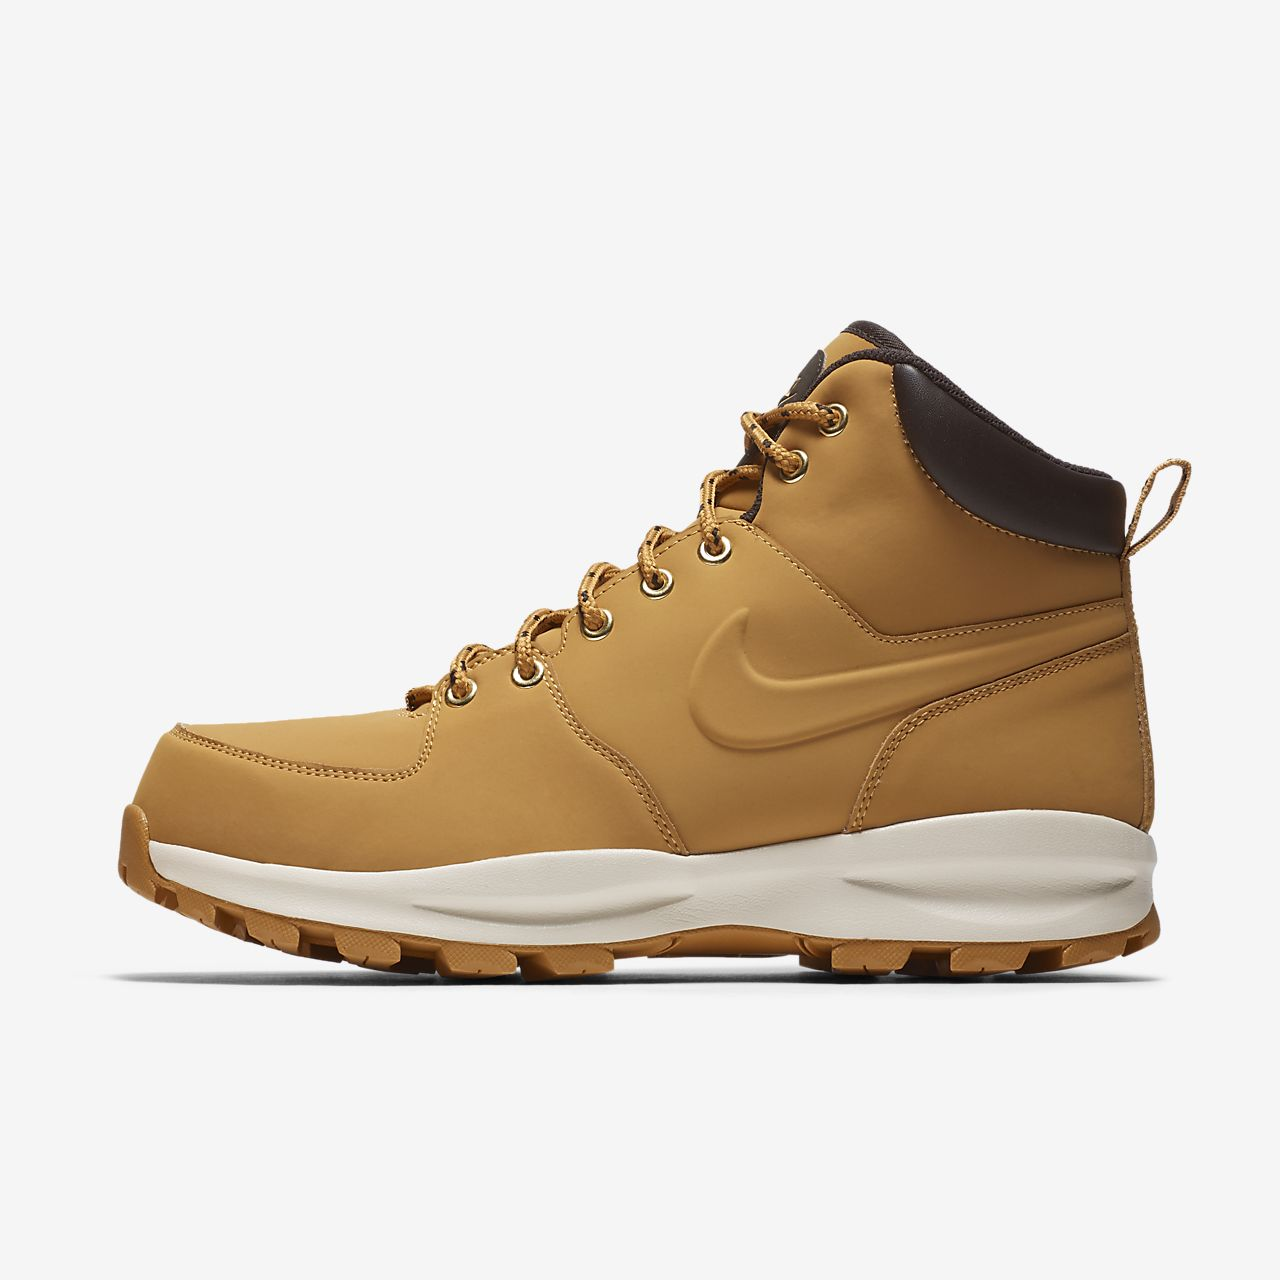 Nike Manoa Men's Boot